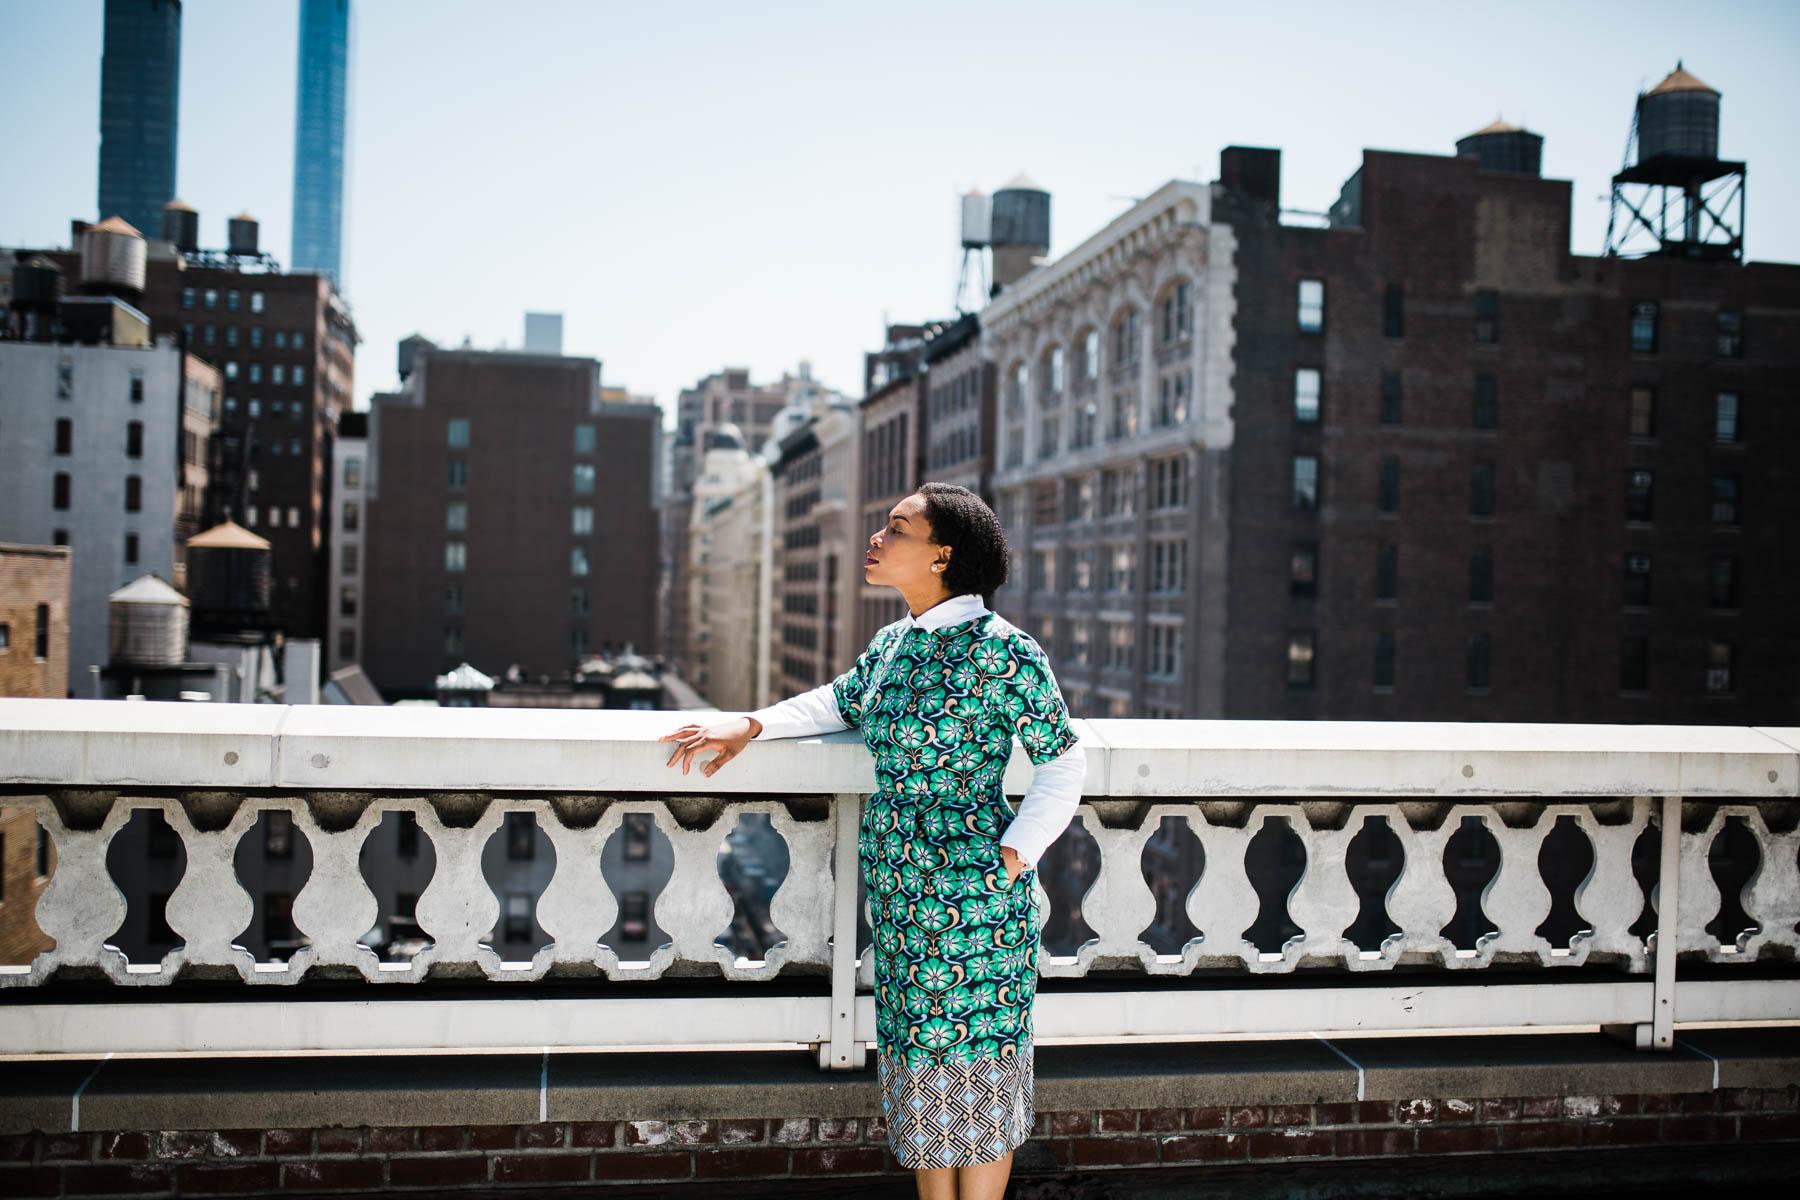 chicago-brooklyn-nyc-portrait-photographer-26.jpg